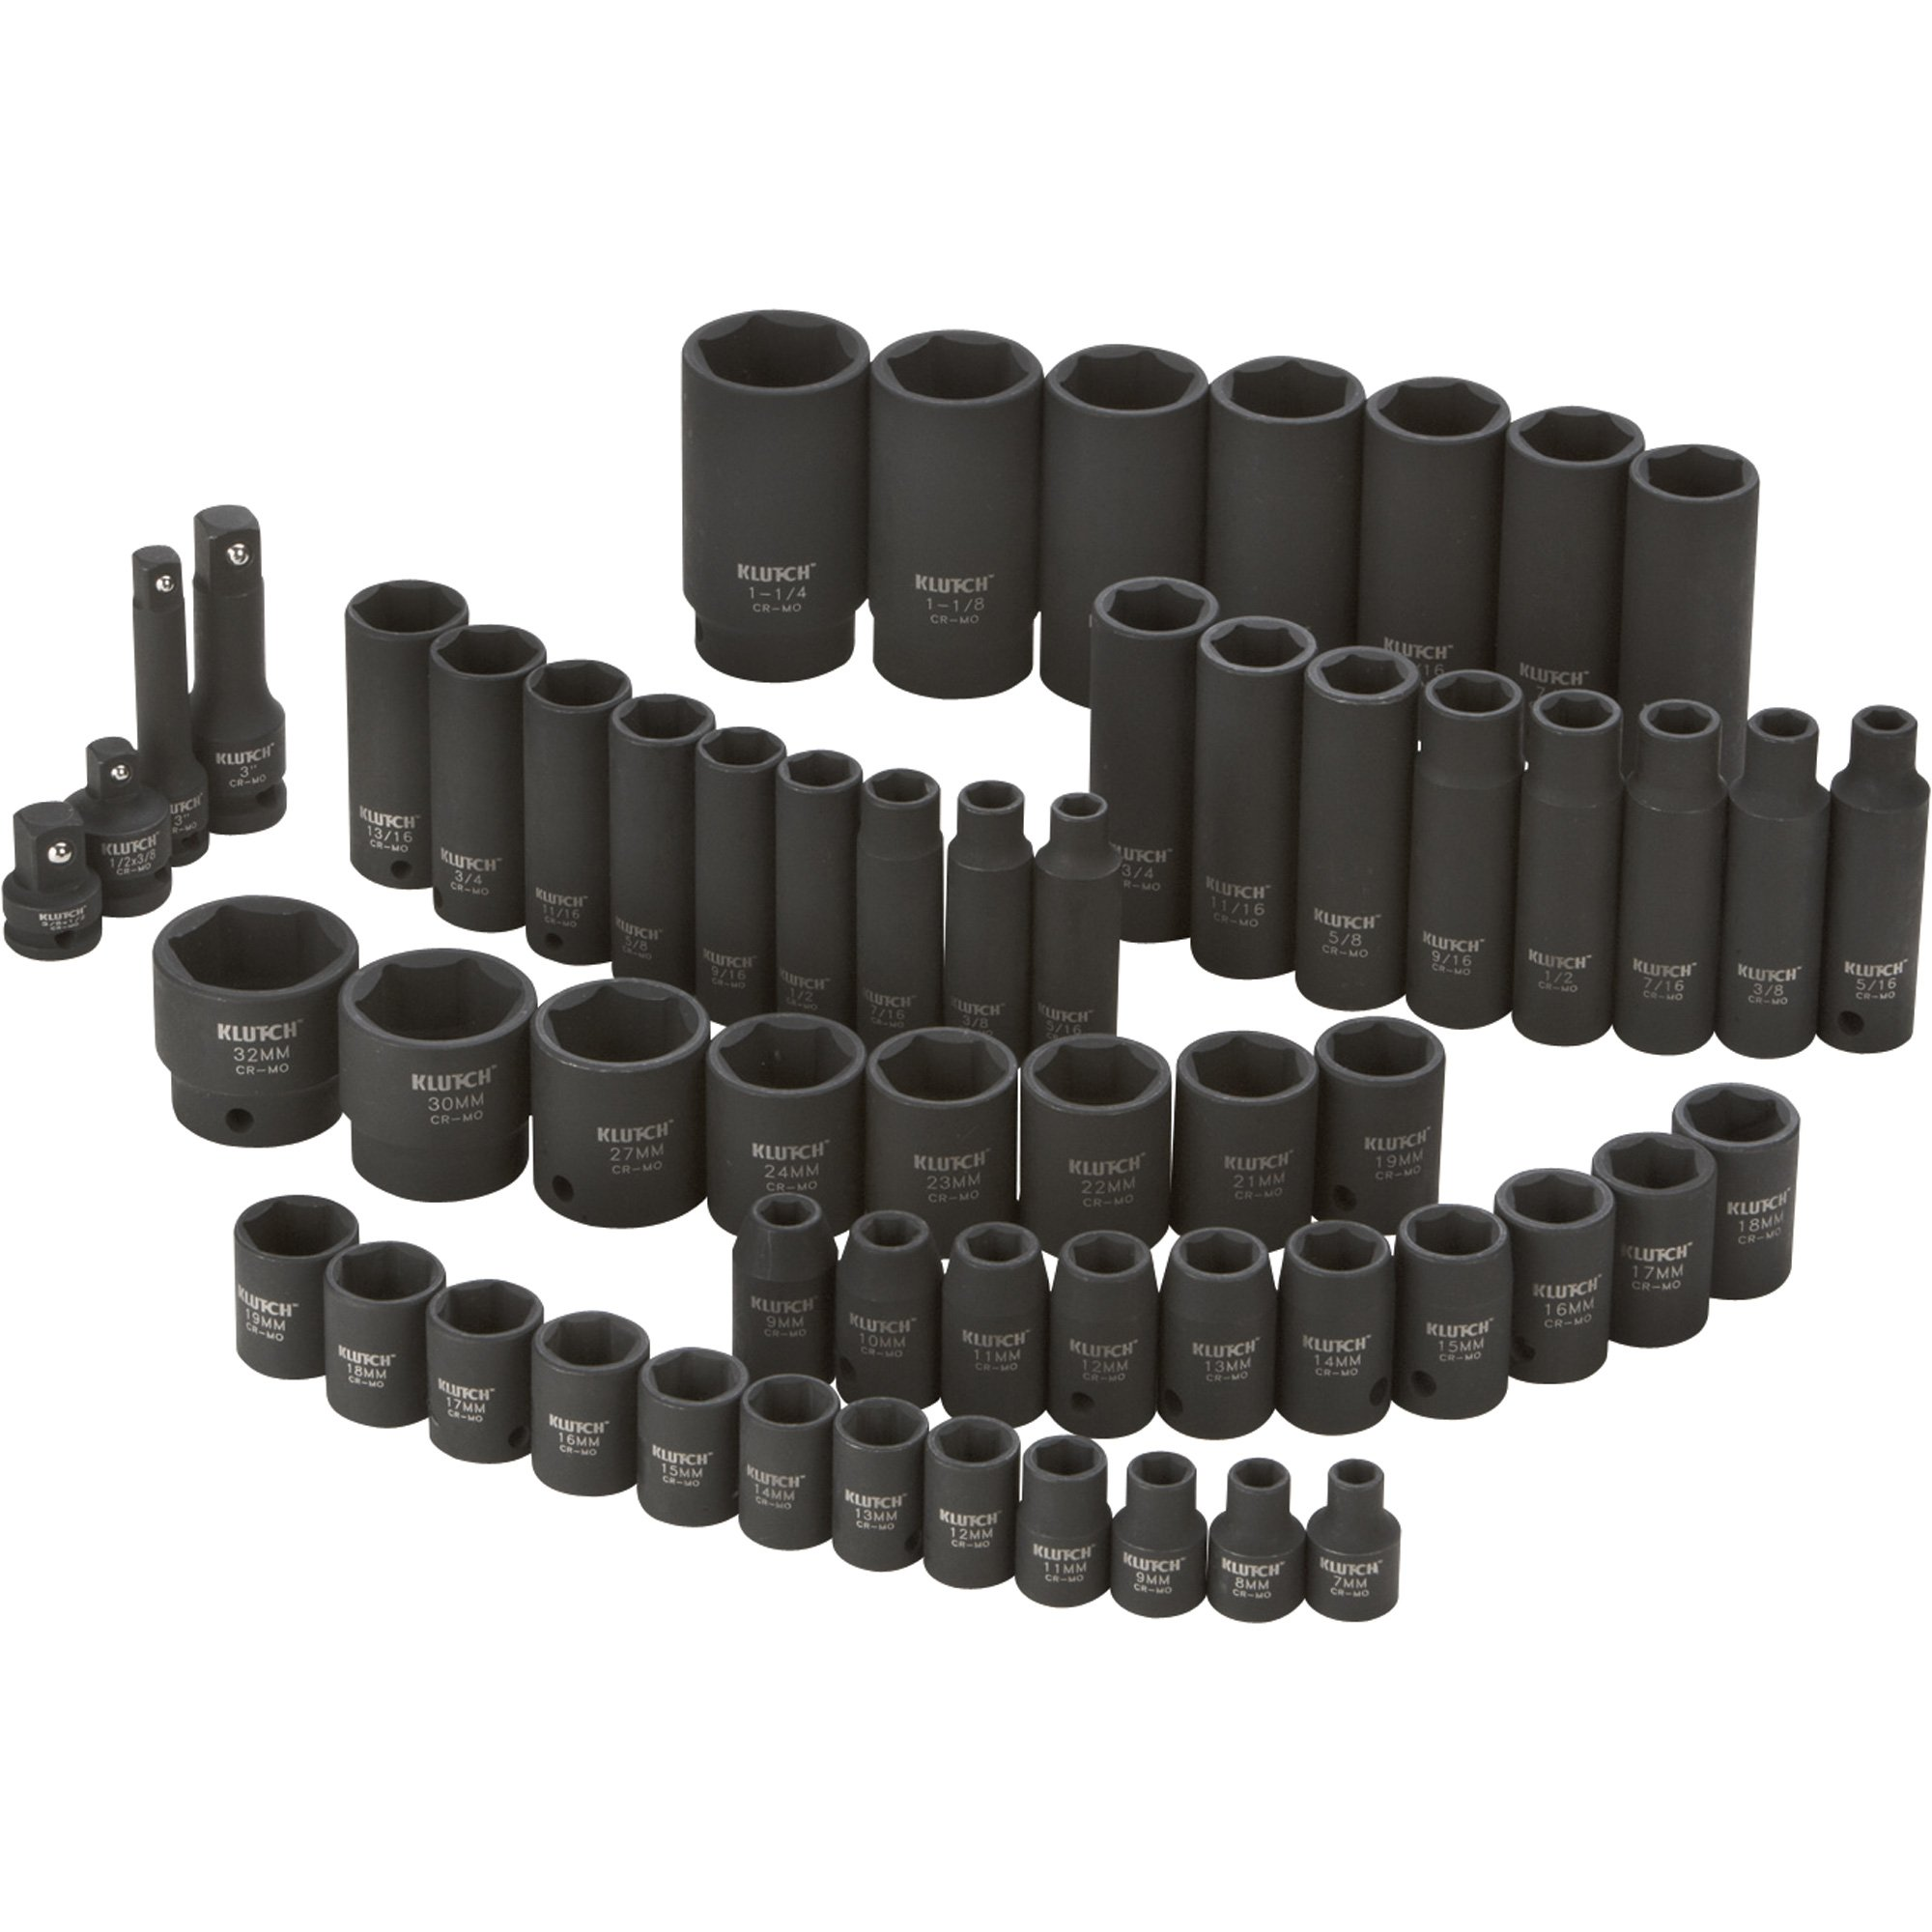 Klutch Impact Socket Set - 59-Pc., 3/8- and 1/2-Drive, SAE/Metric